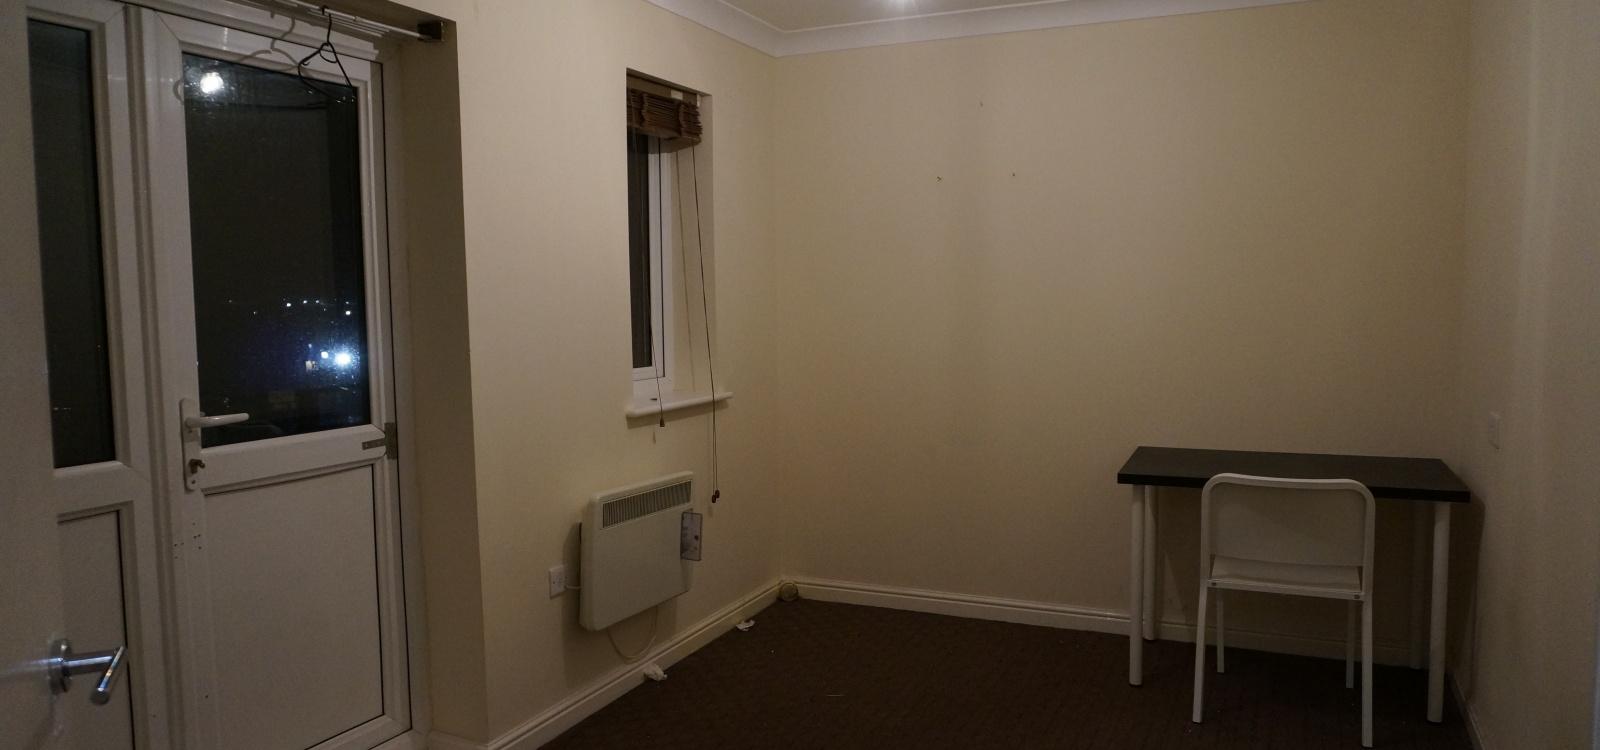 Thames Road,Grays,Essex,United Kingdom,1 BathroomBathrooms,Flat,Meridian Court,Thames Road,1044